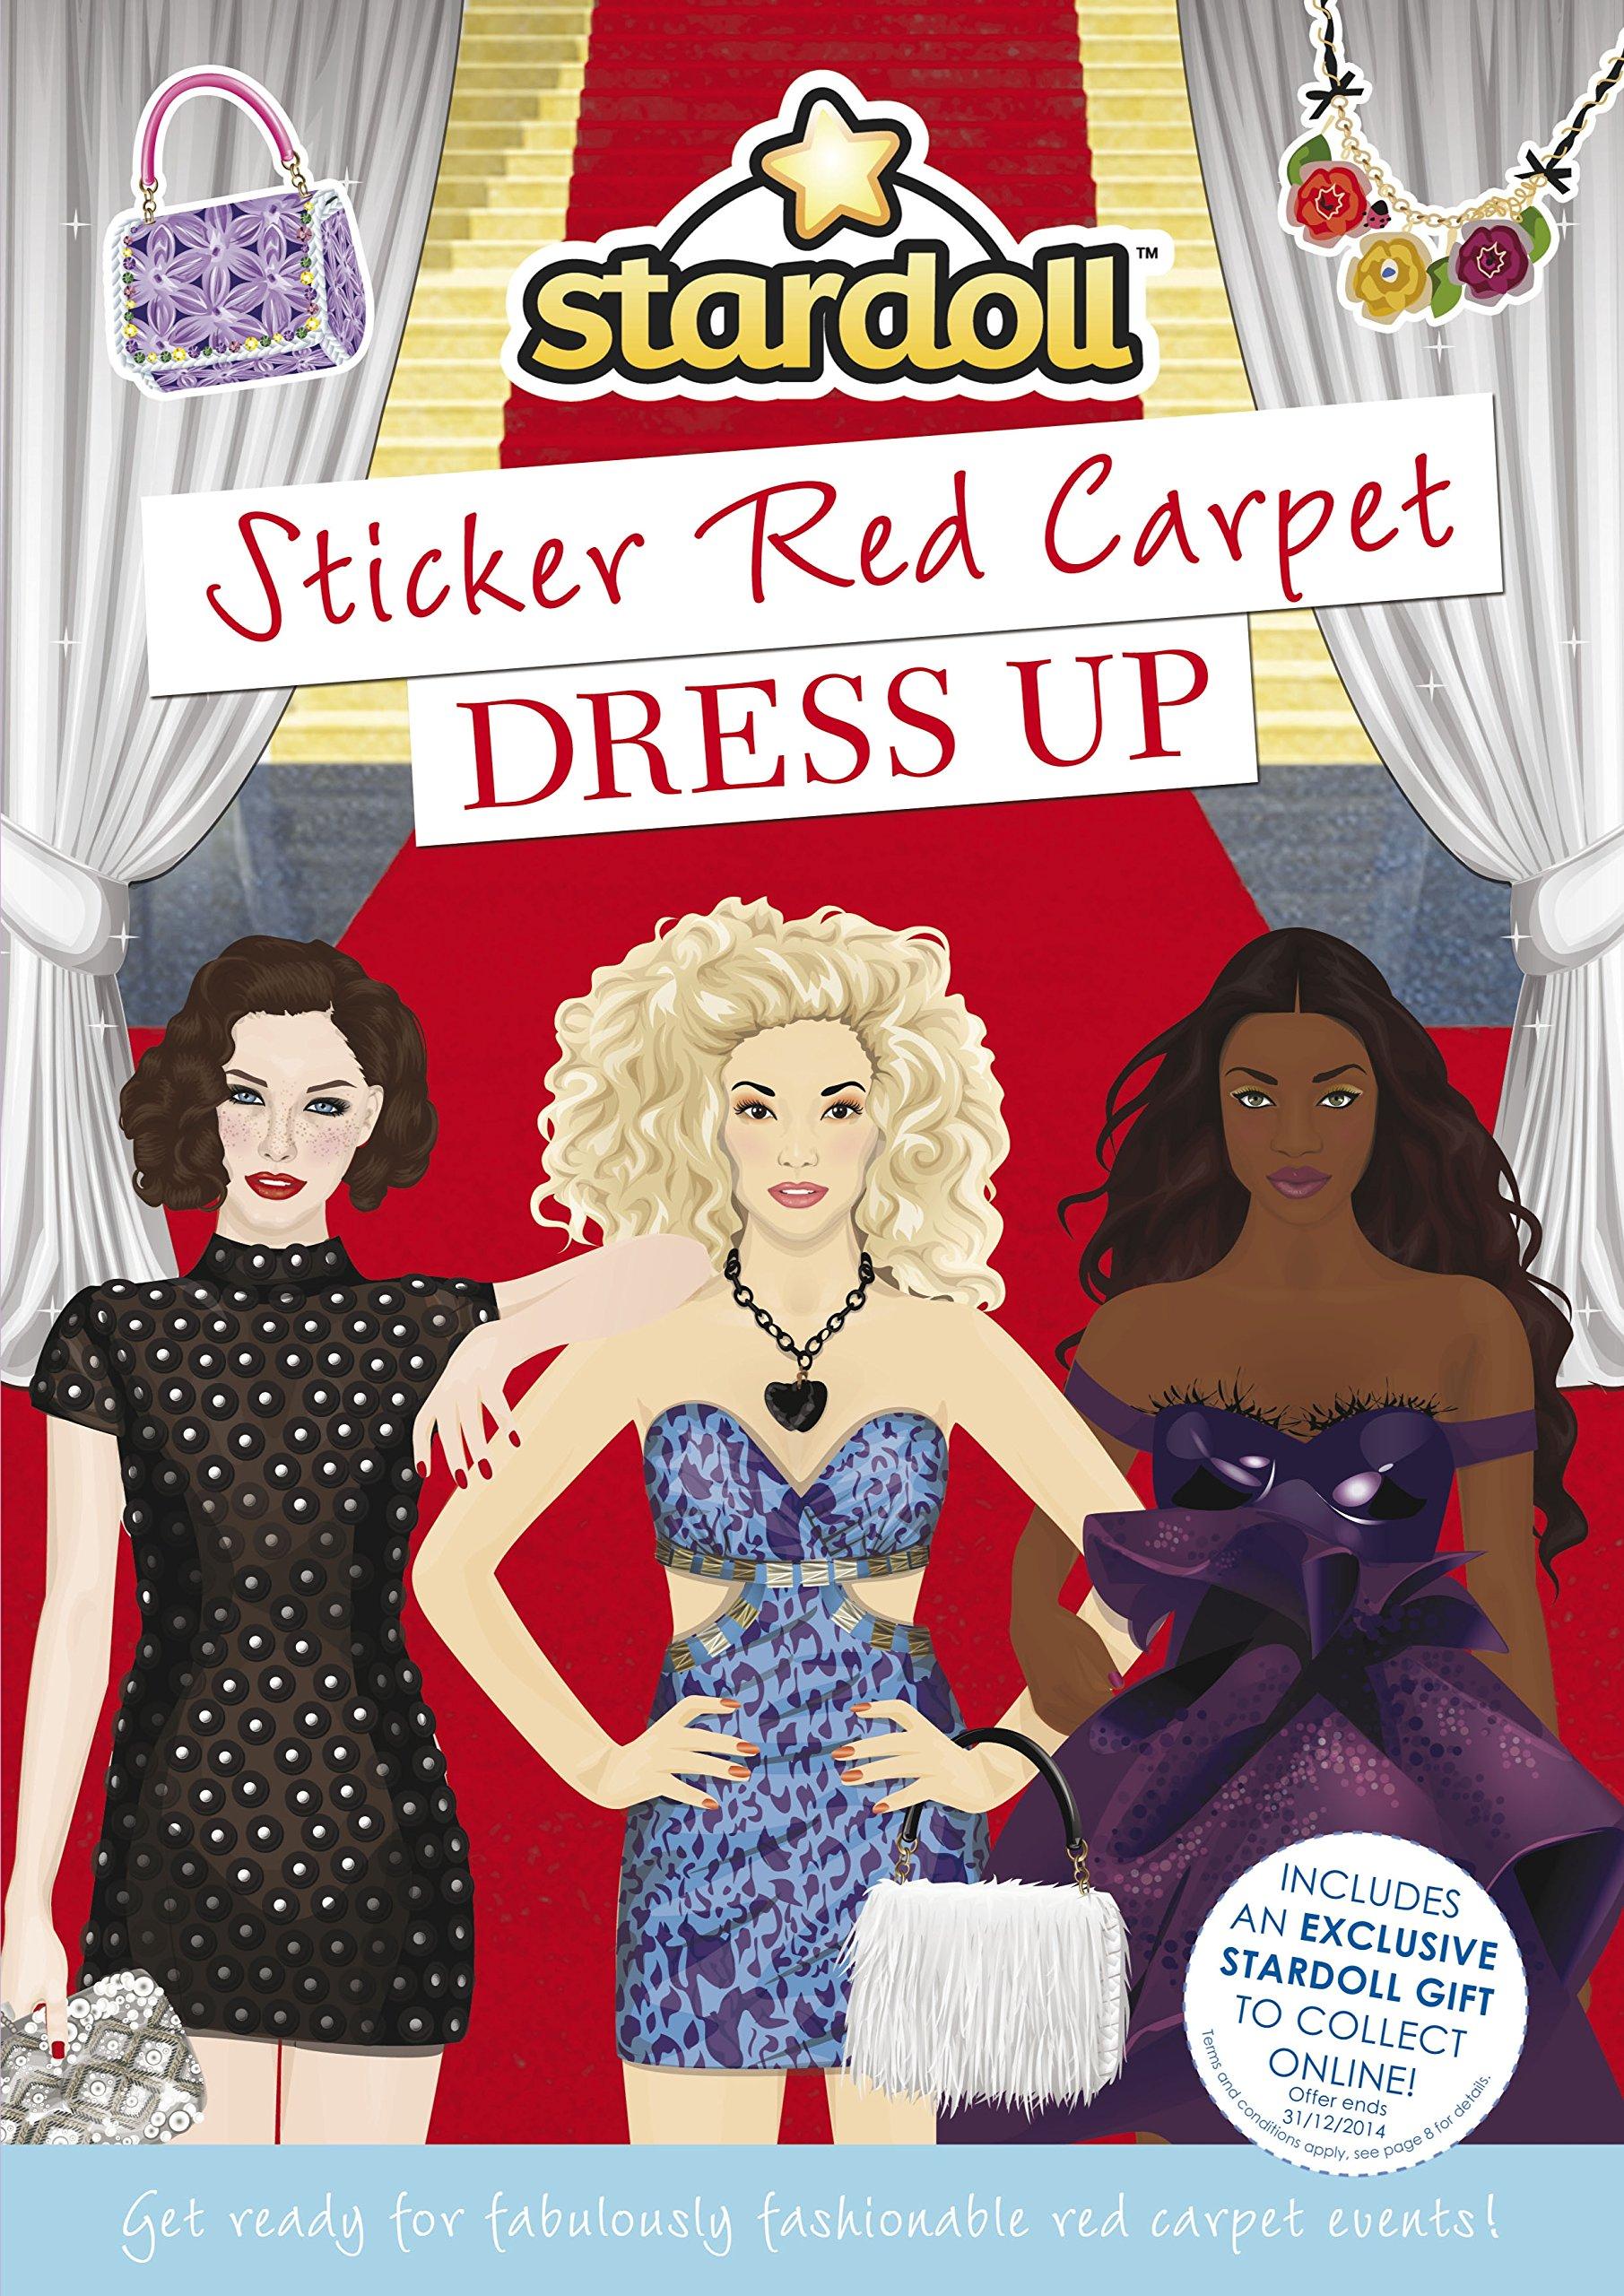 Stardoll: Sticker Red Carpet Dress Up ebook